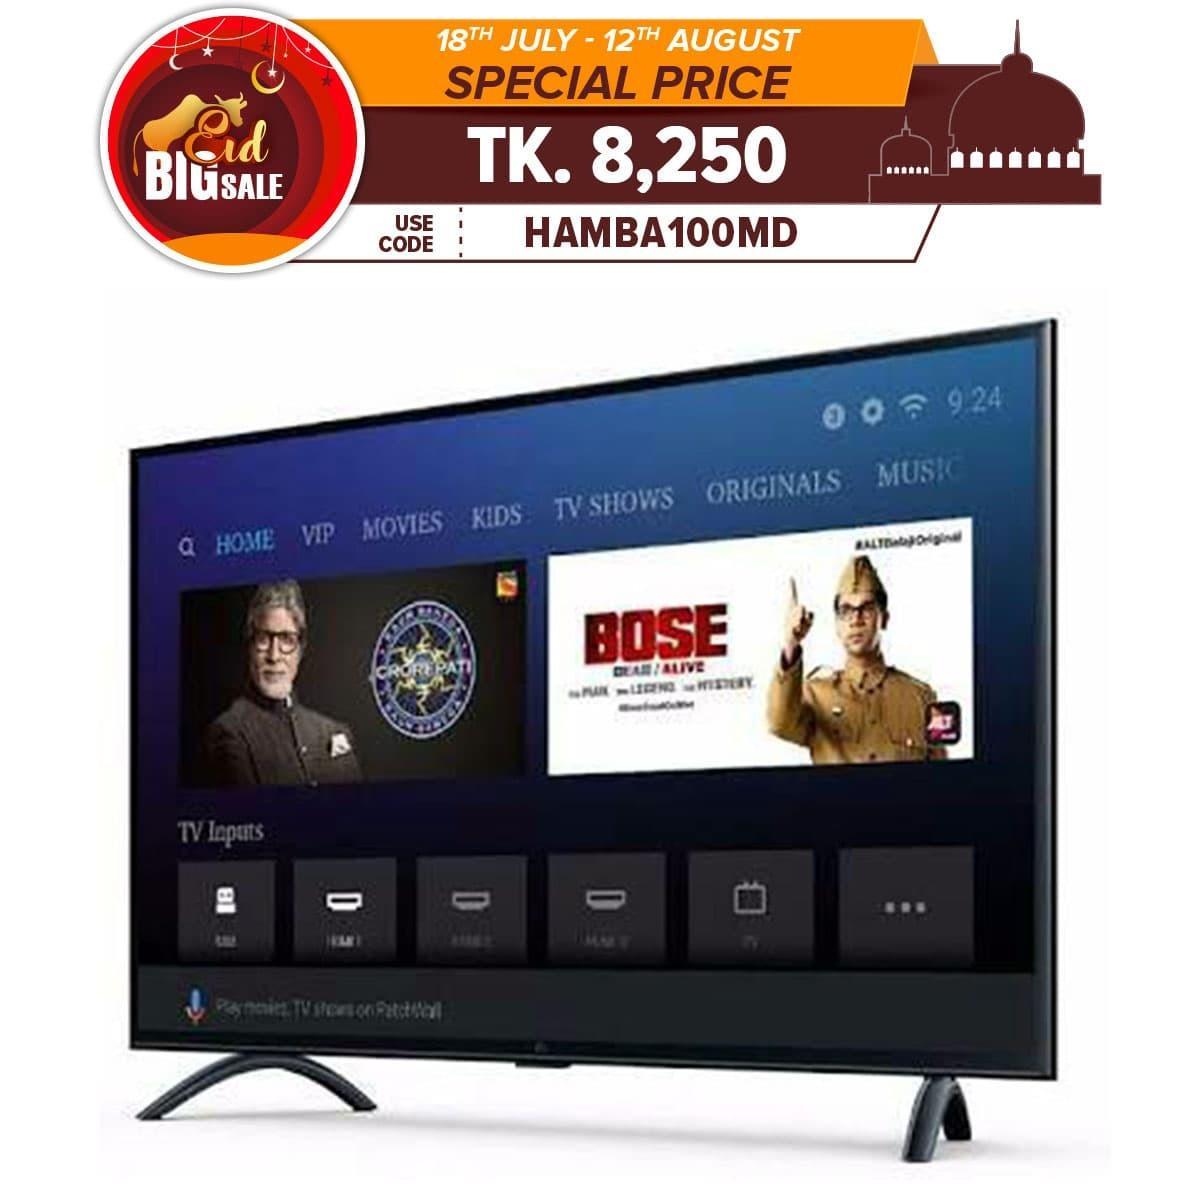 Televisions Online: Best TV Price In Bangladesh 2019 - Daraz com bd